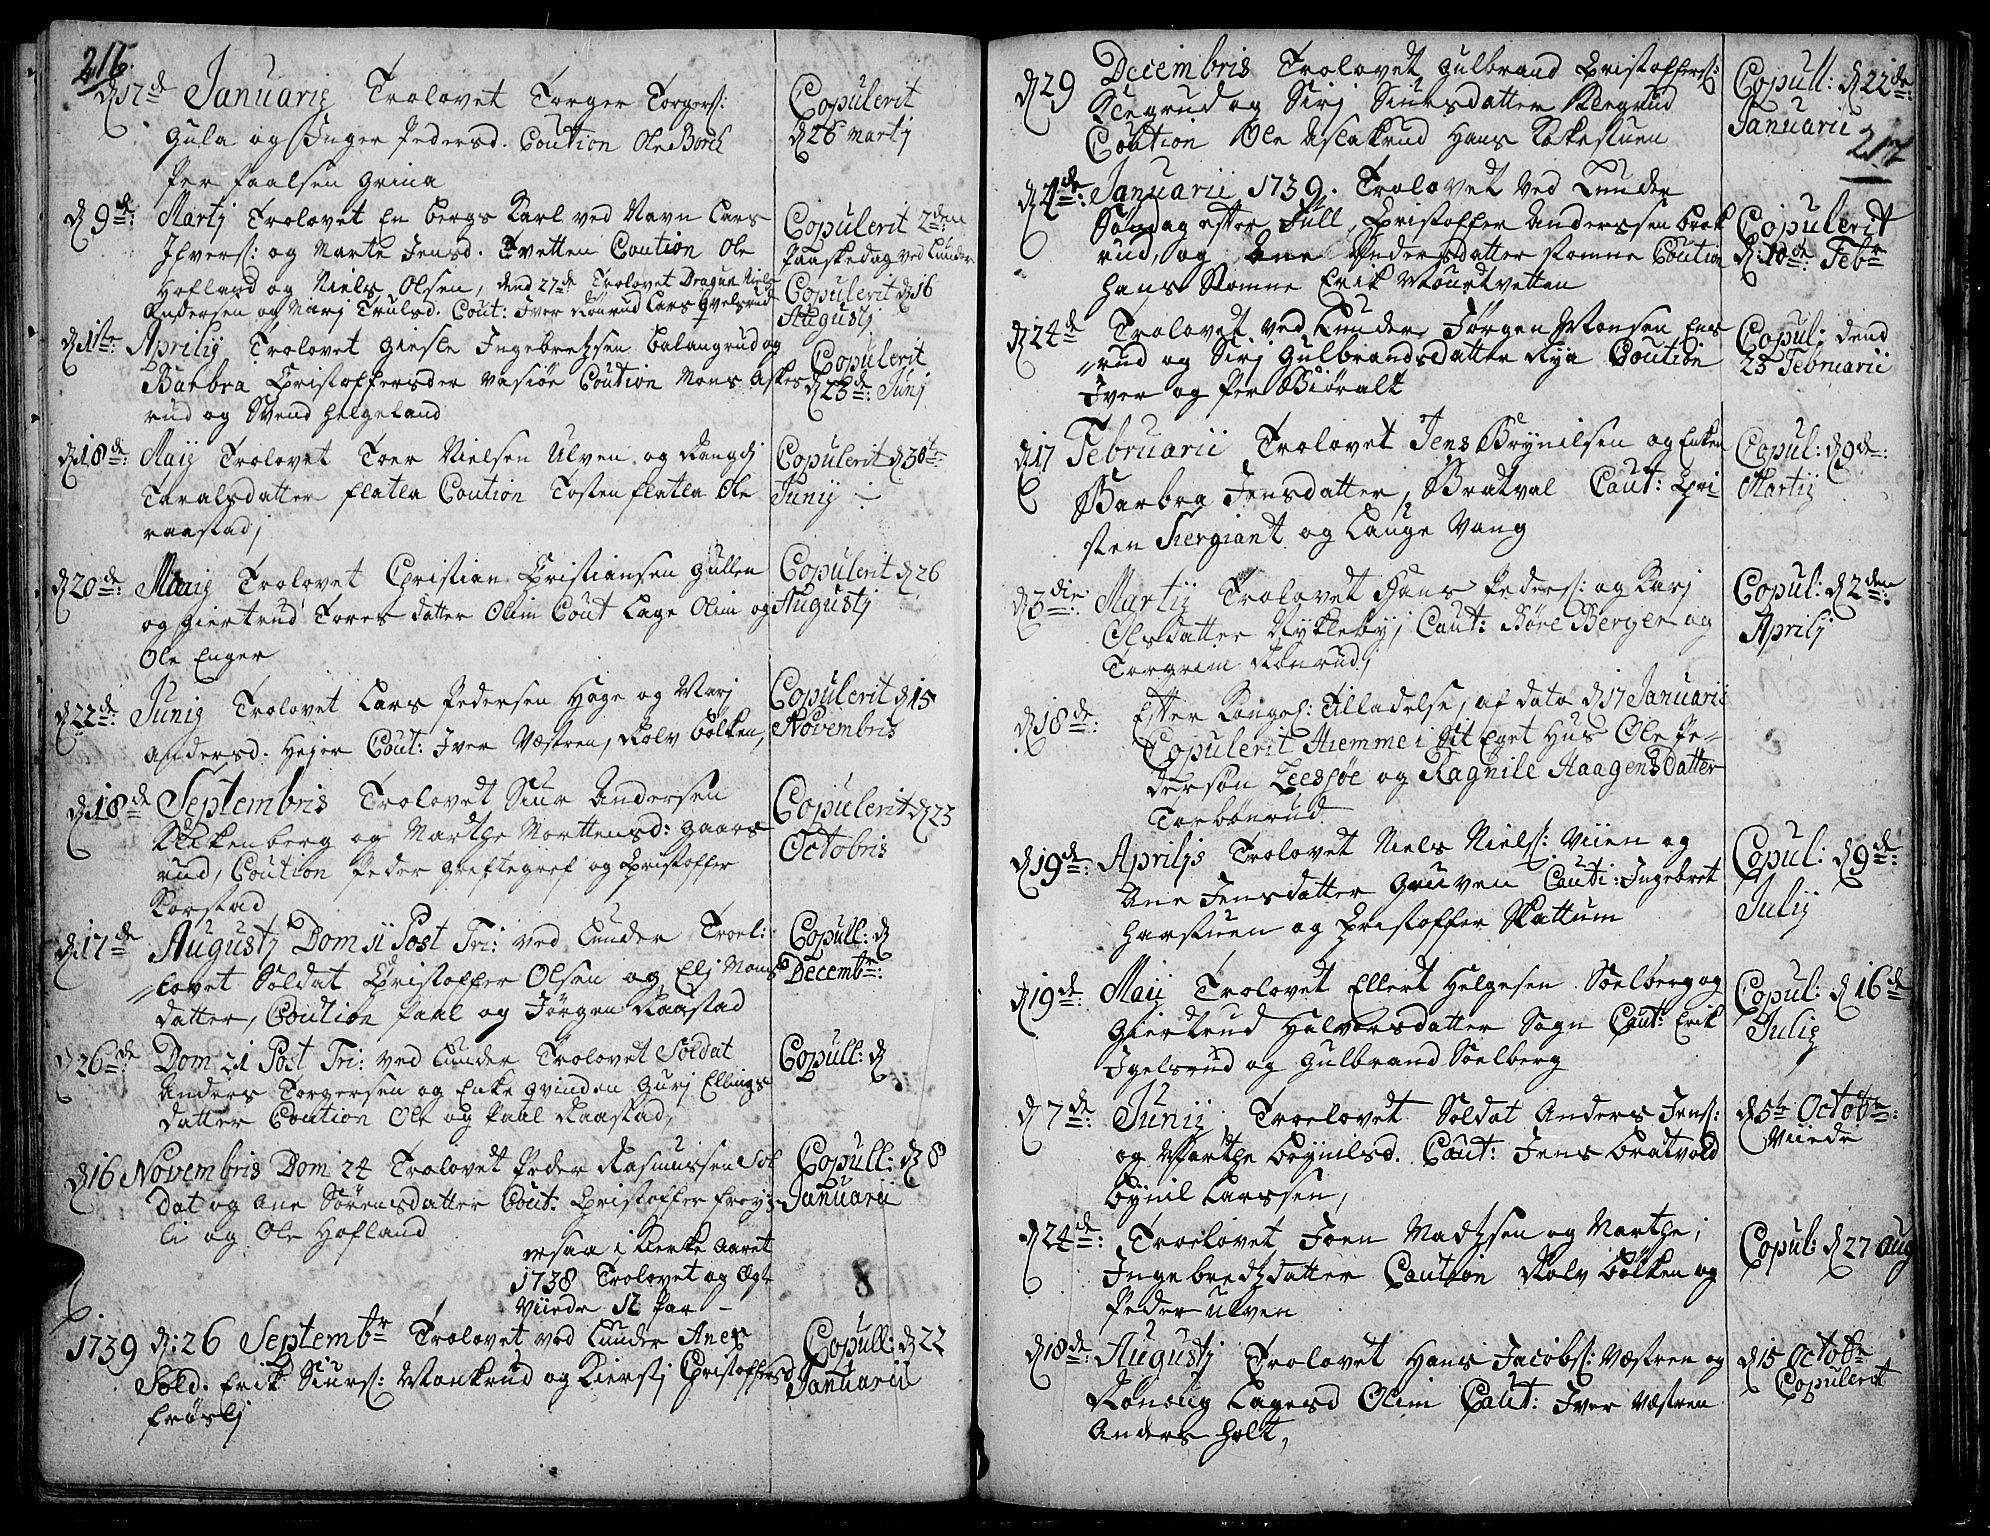 SAH, Jevnaker prestekontor, Ministerialbok nr. 2, 1725-1751, s. 216-217